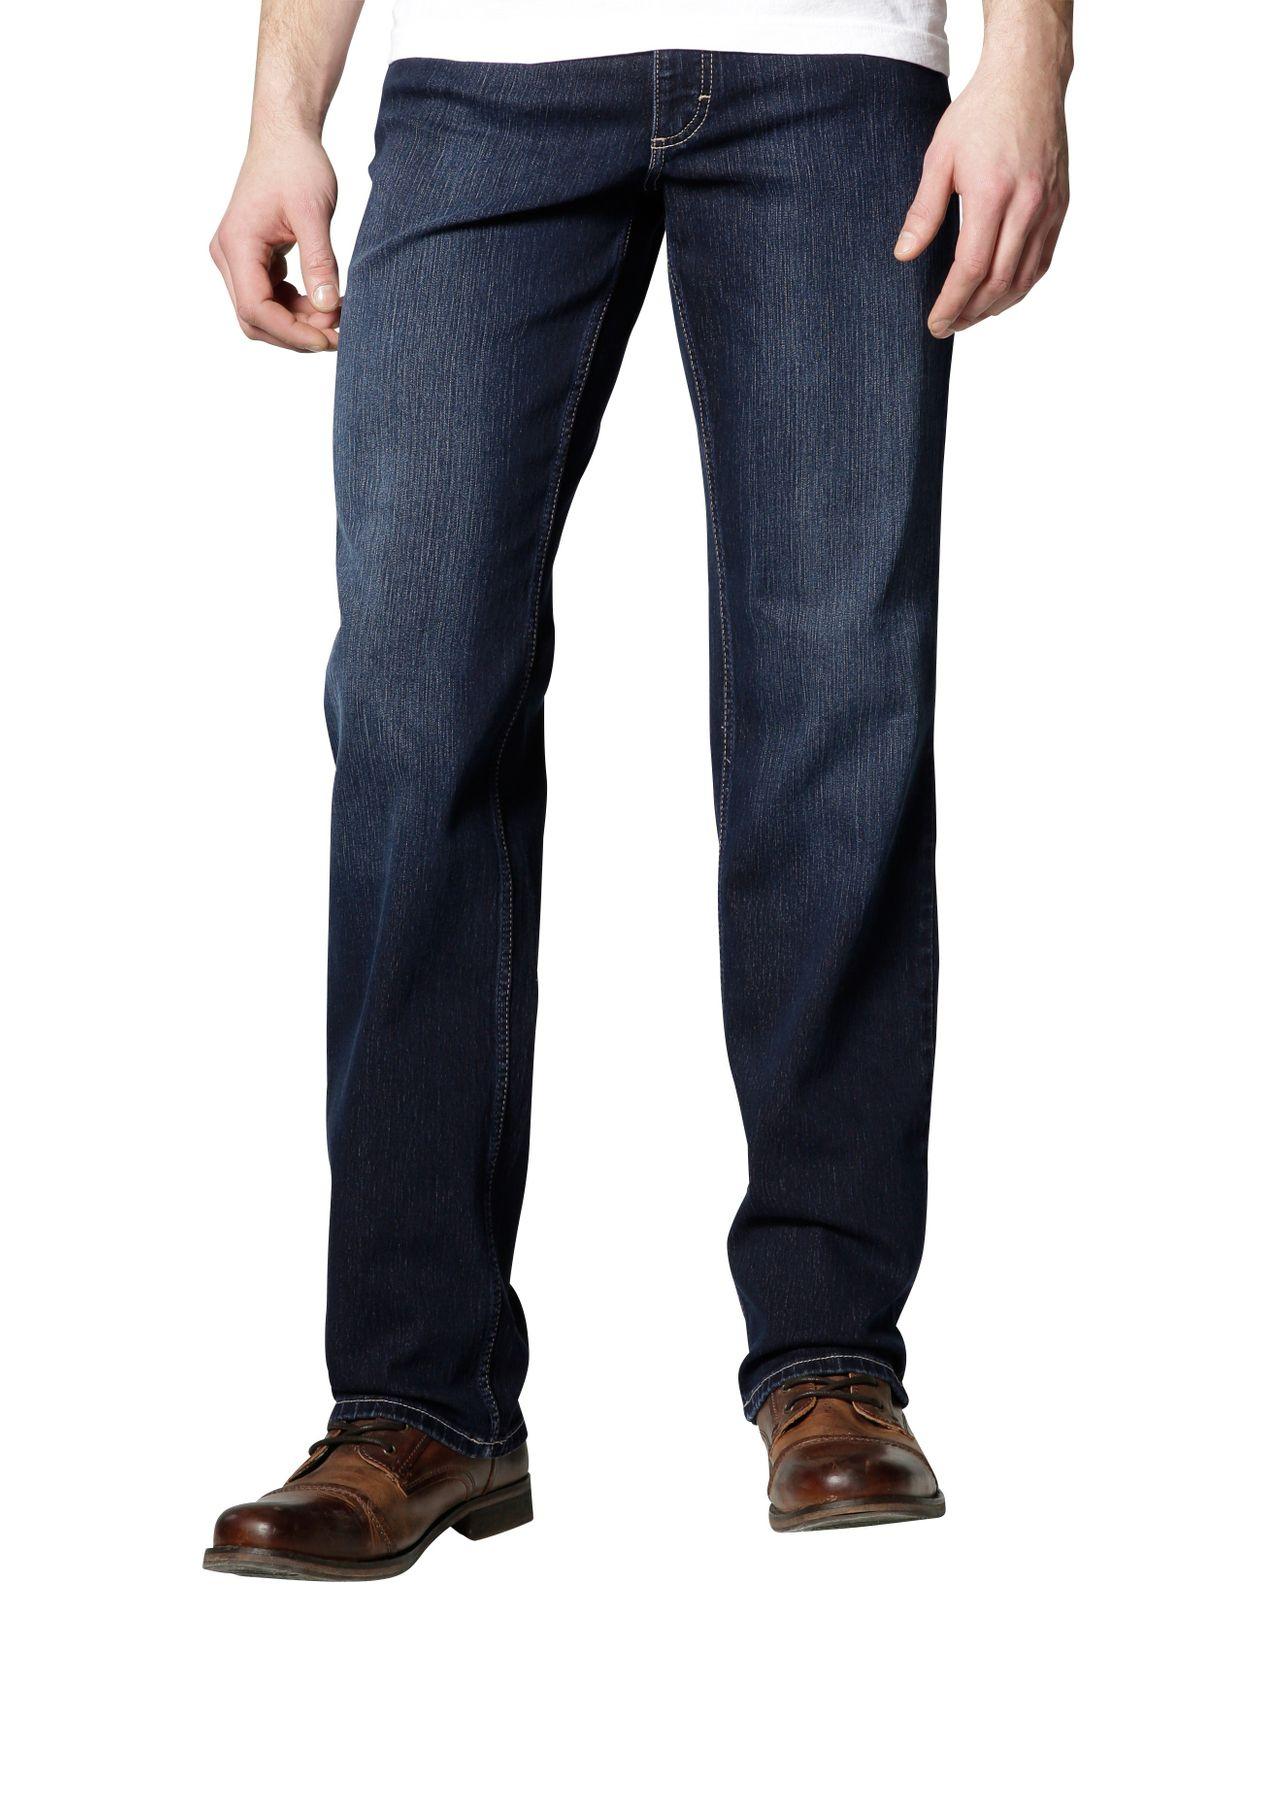 Mustang -  Herren 5-Pocket Jeans, Medium rise/Straight Leg, Farbe old stone used, Big Sur (3169-5126-580)